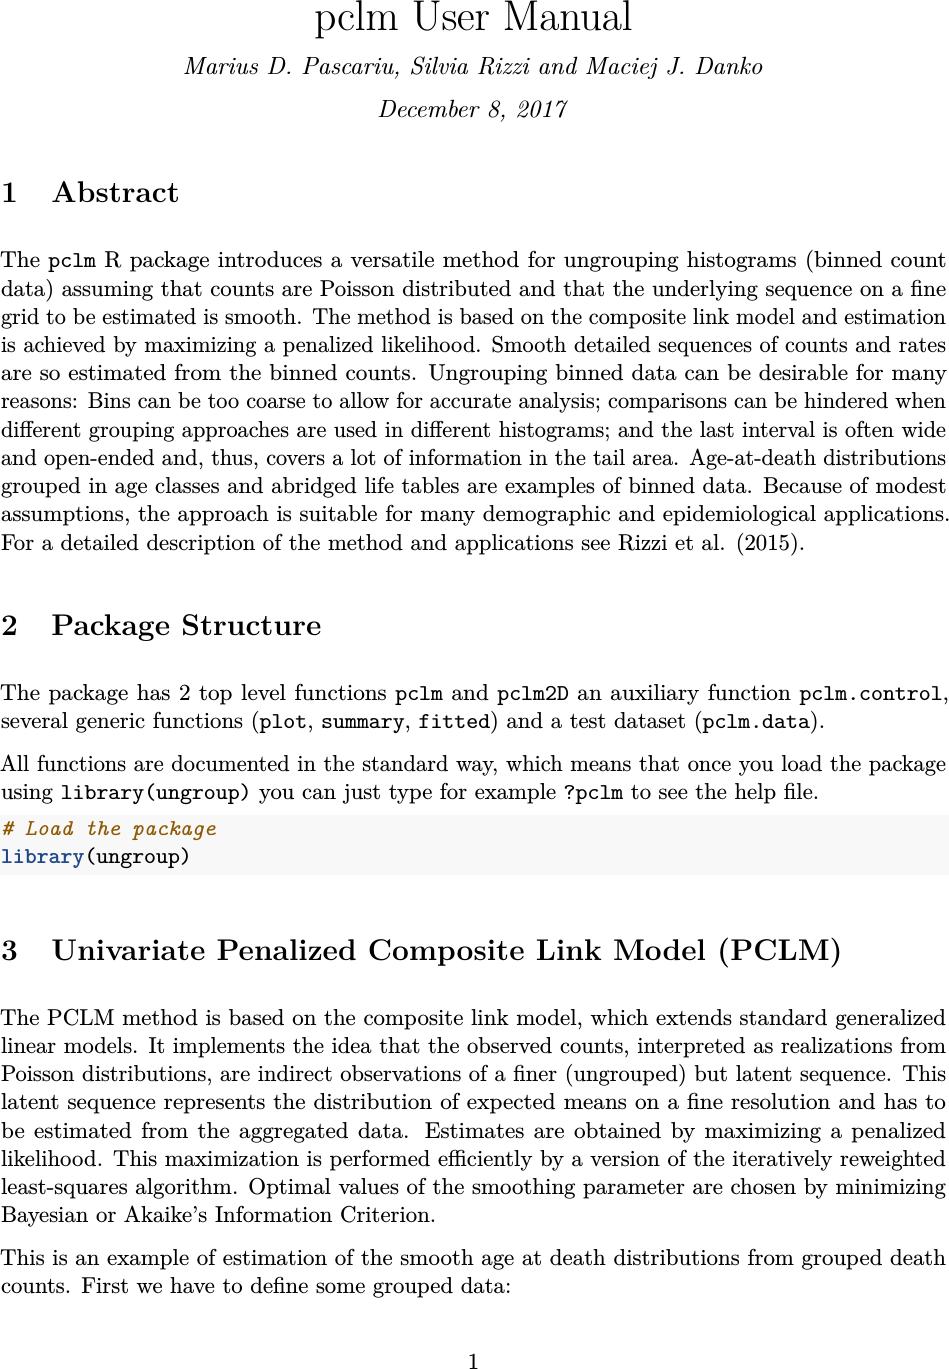 Pclm User Manual